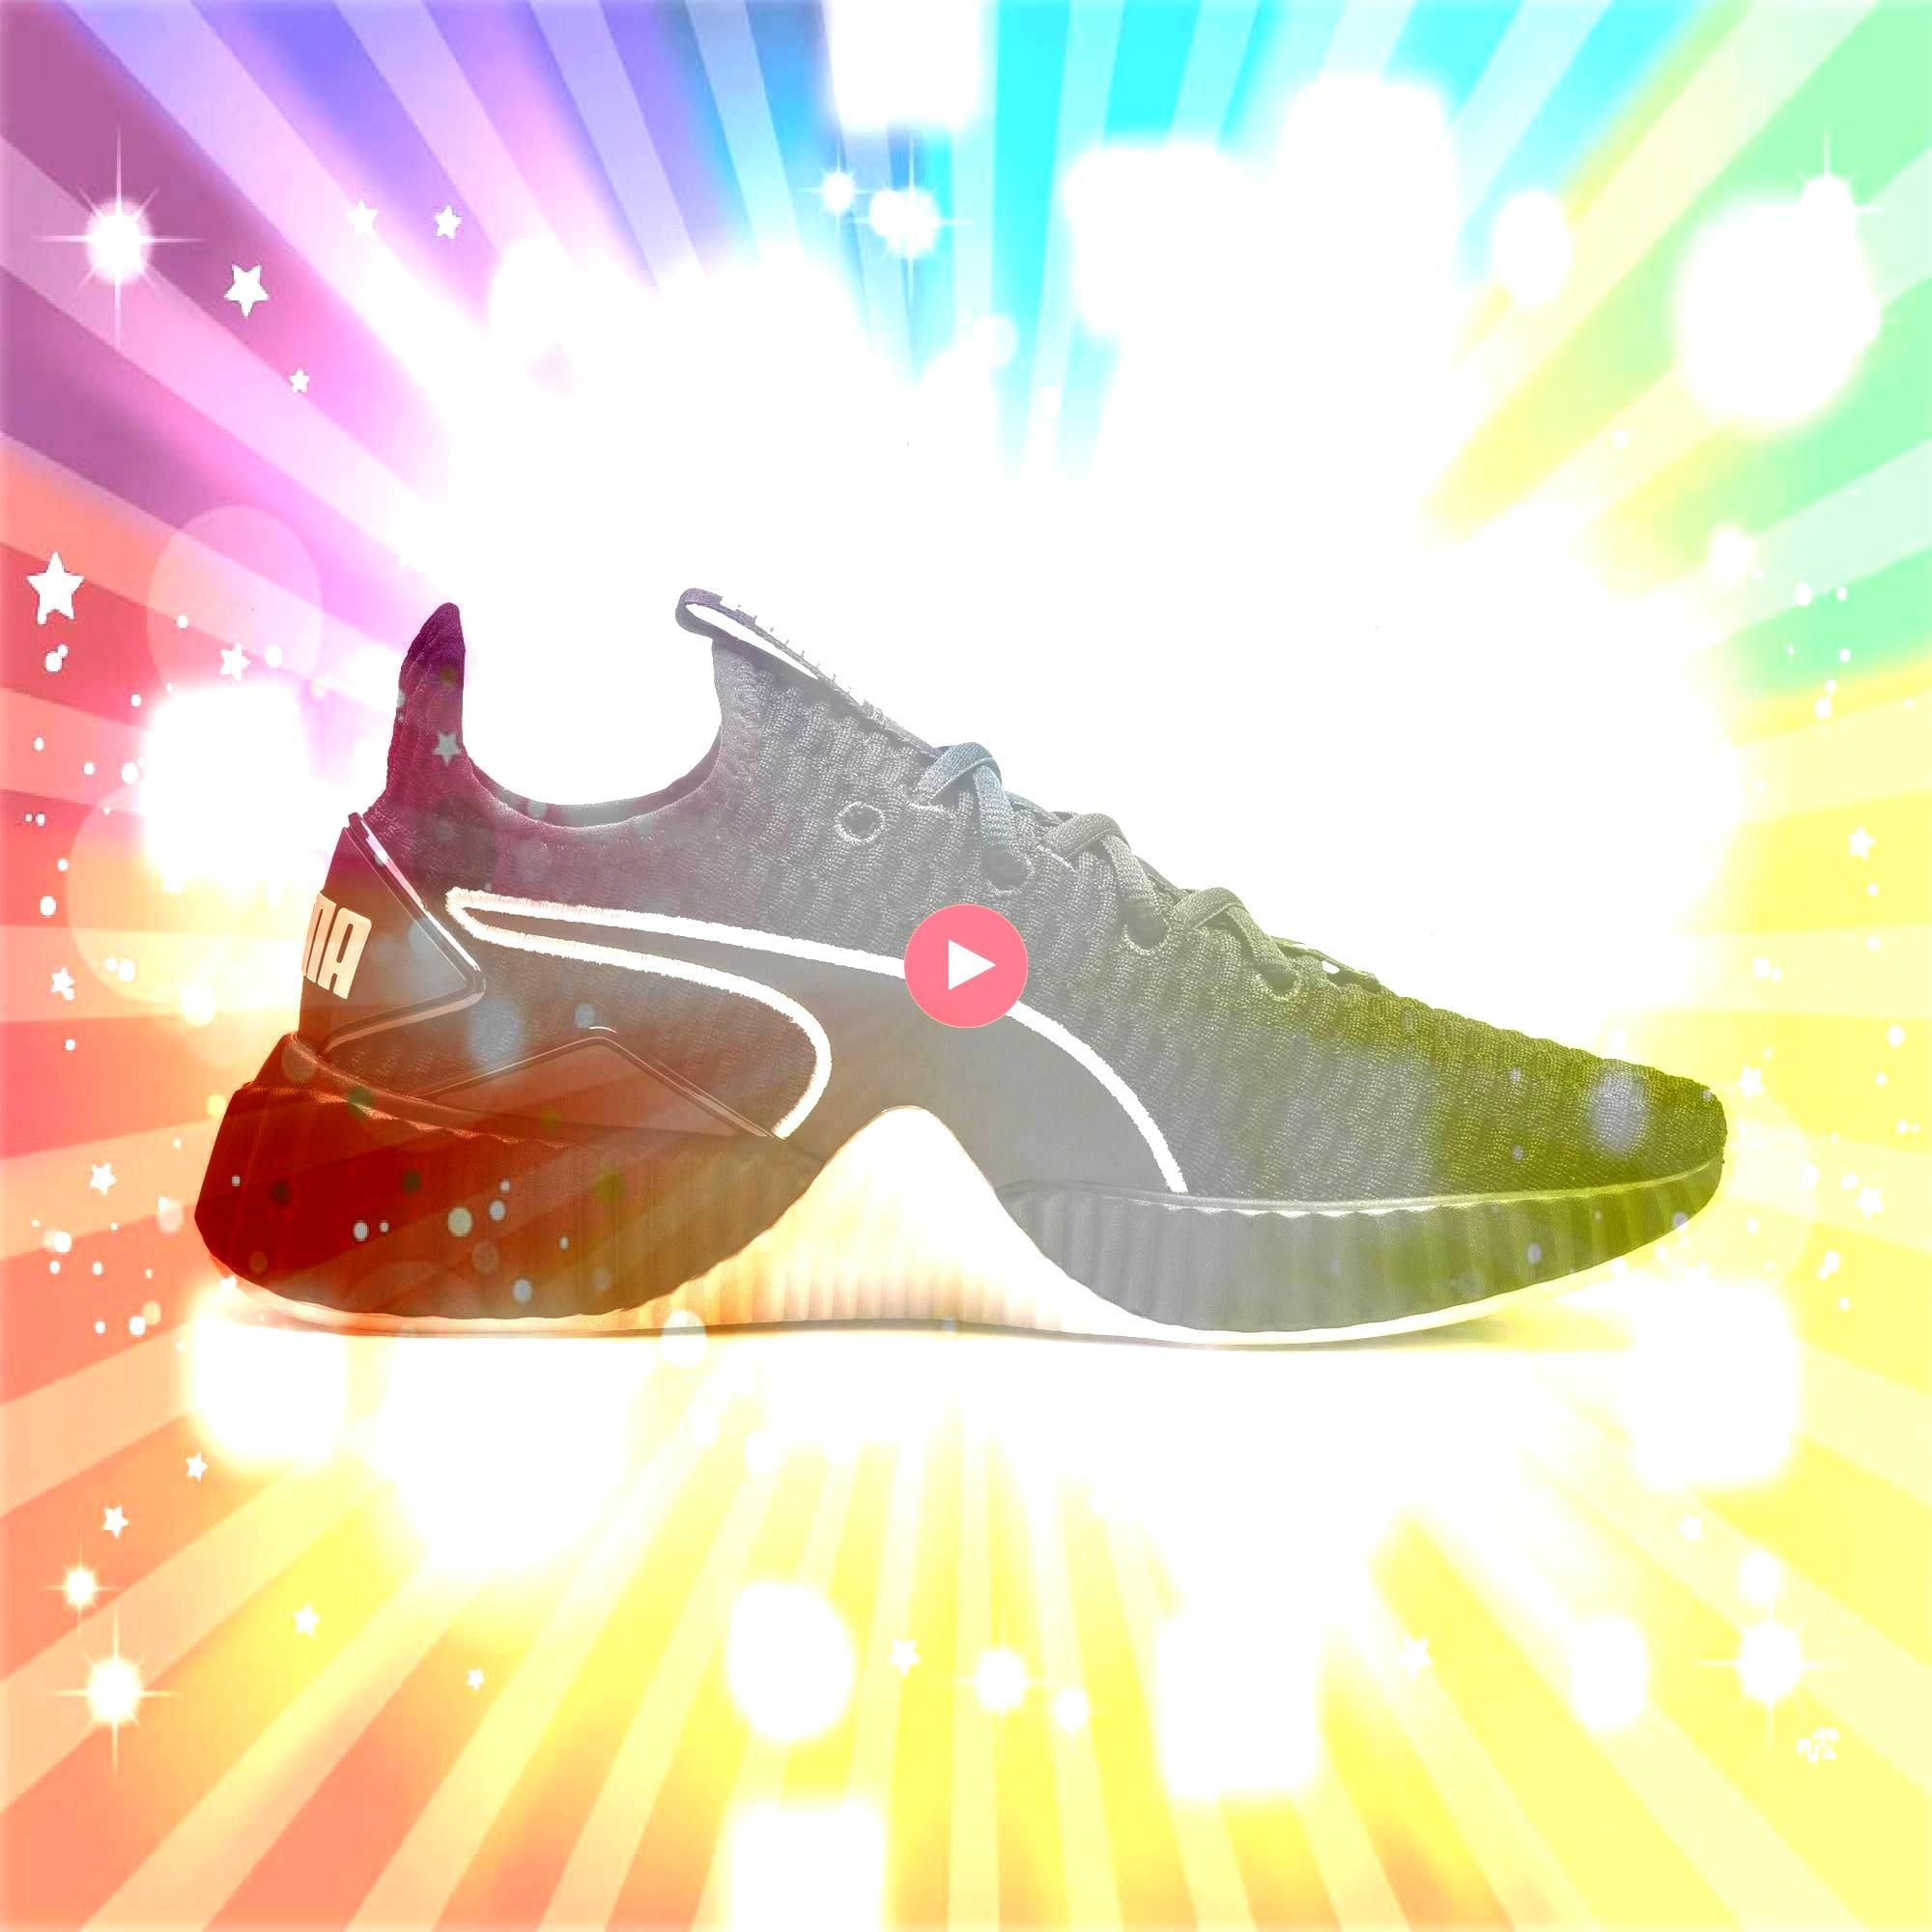 Womens Trainers in BlackPastel Parchment size 35 PUMA Defy Damen Sneaker in Schwarz  Pastell Pergament Größe 35PUMA Defy Womens Trainers in BlackPastel Parchme...